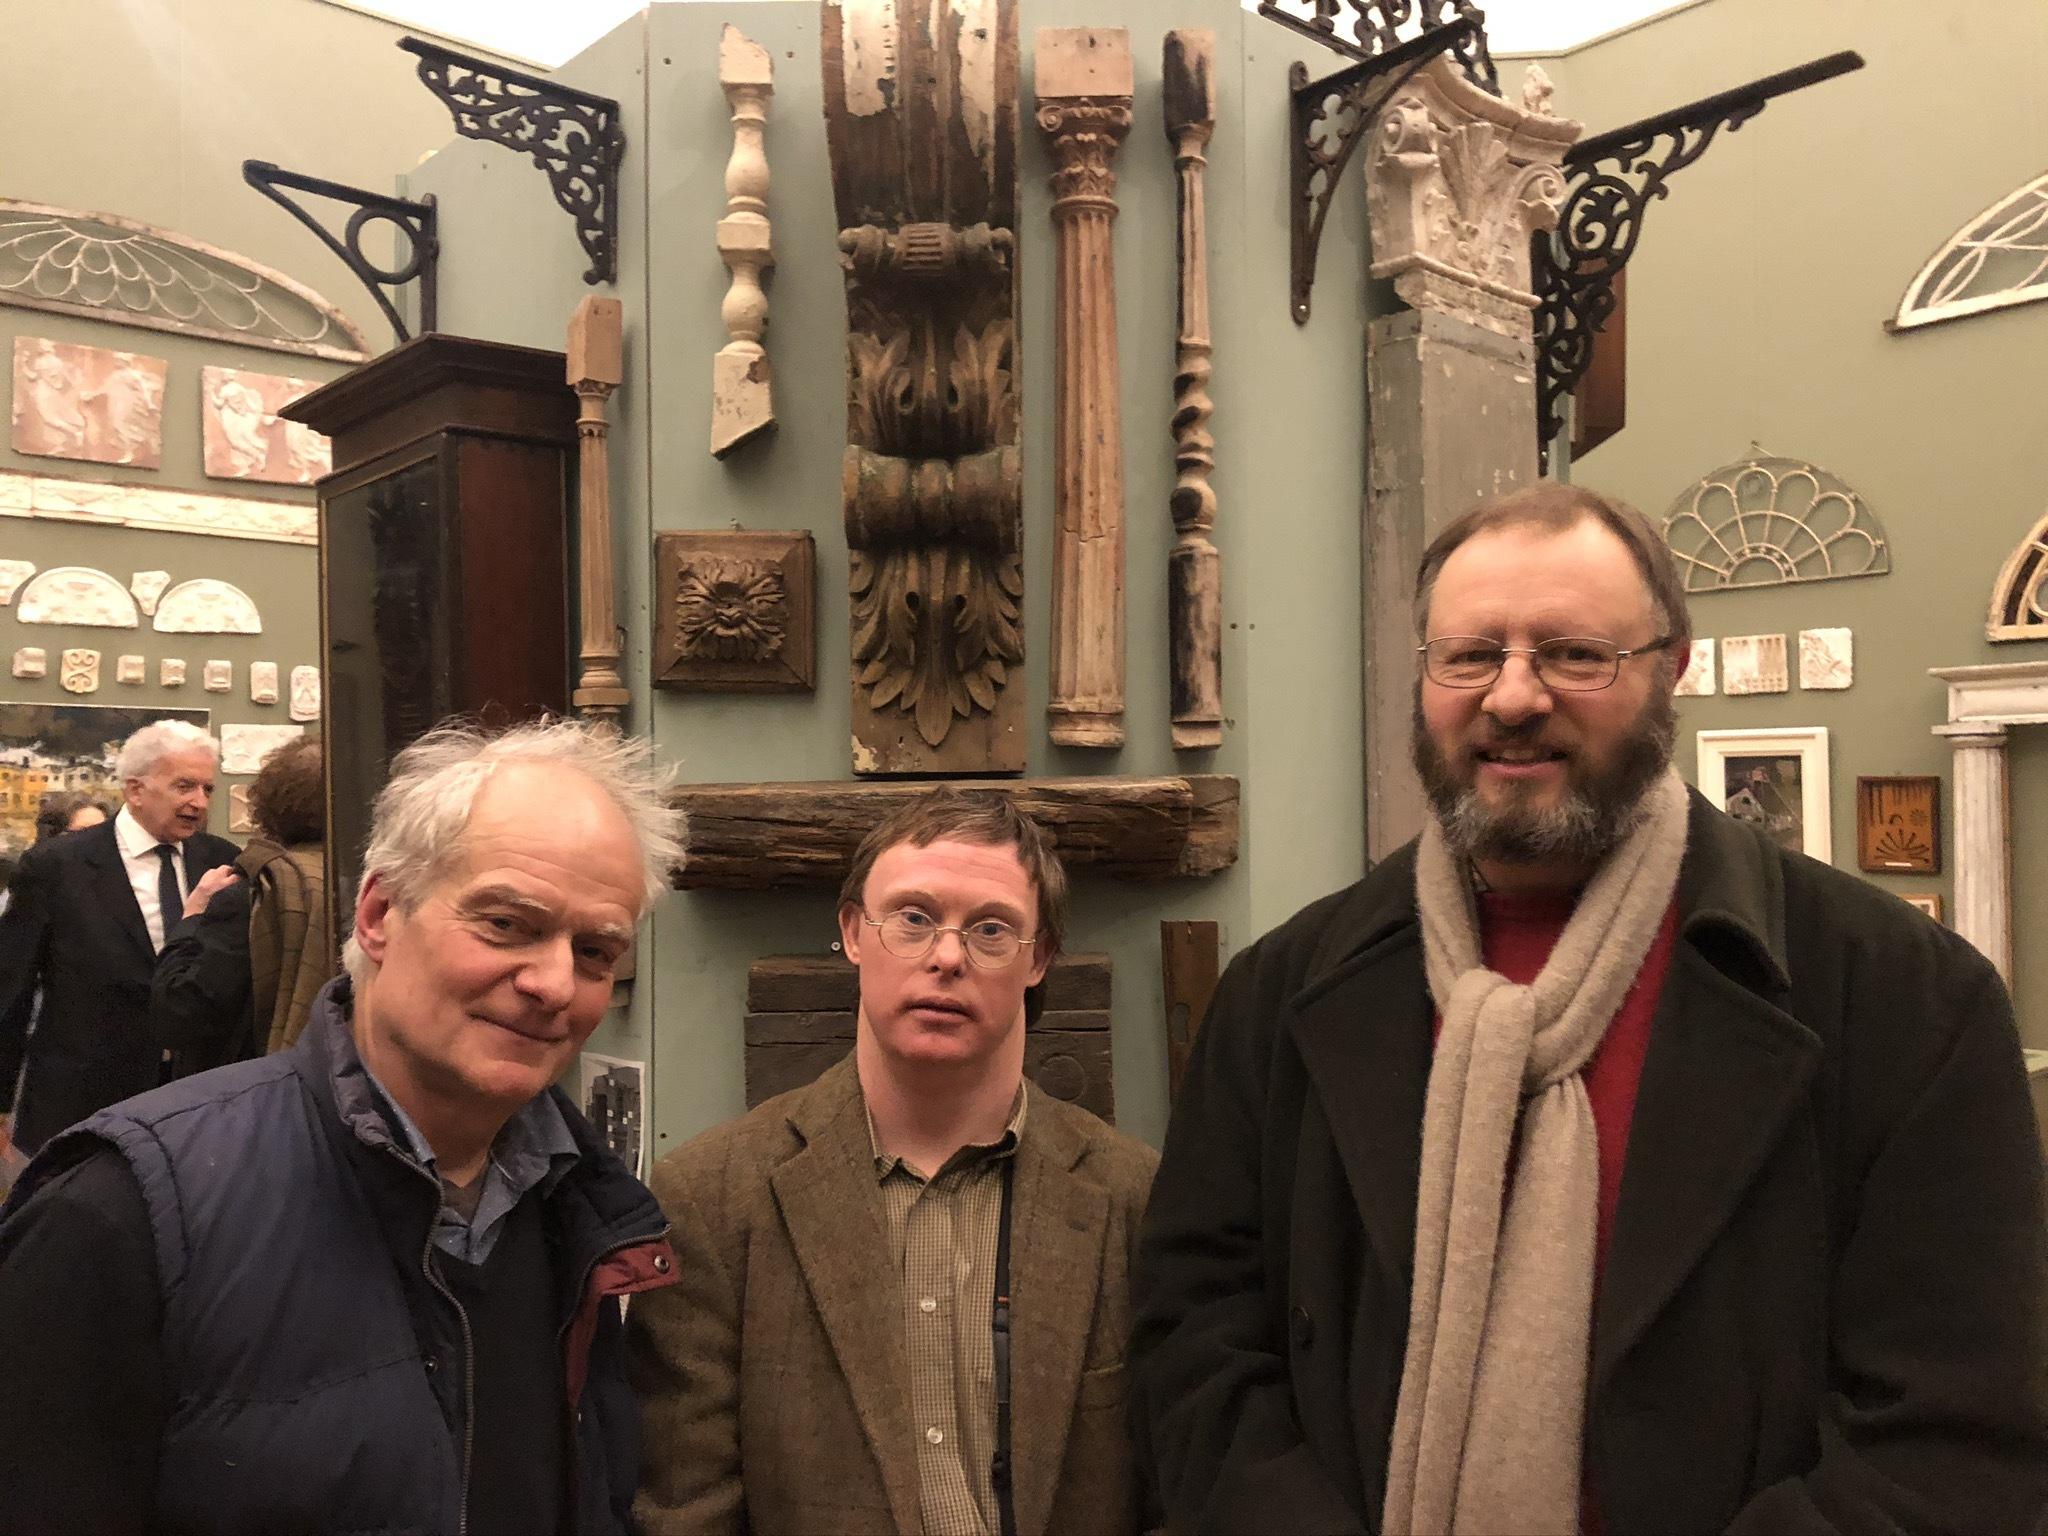 Peter-Pearson-Shane-Byrne-Andrew-Smith.JPEG#asset:13507